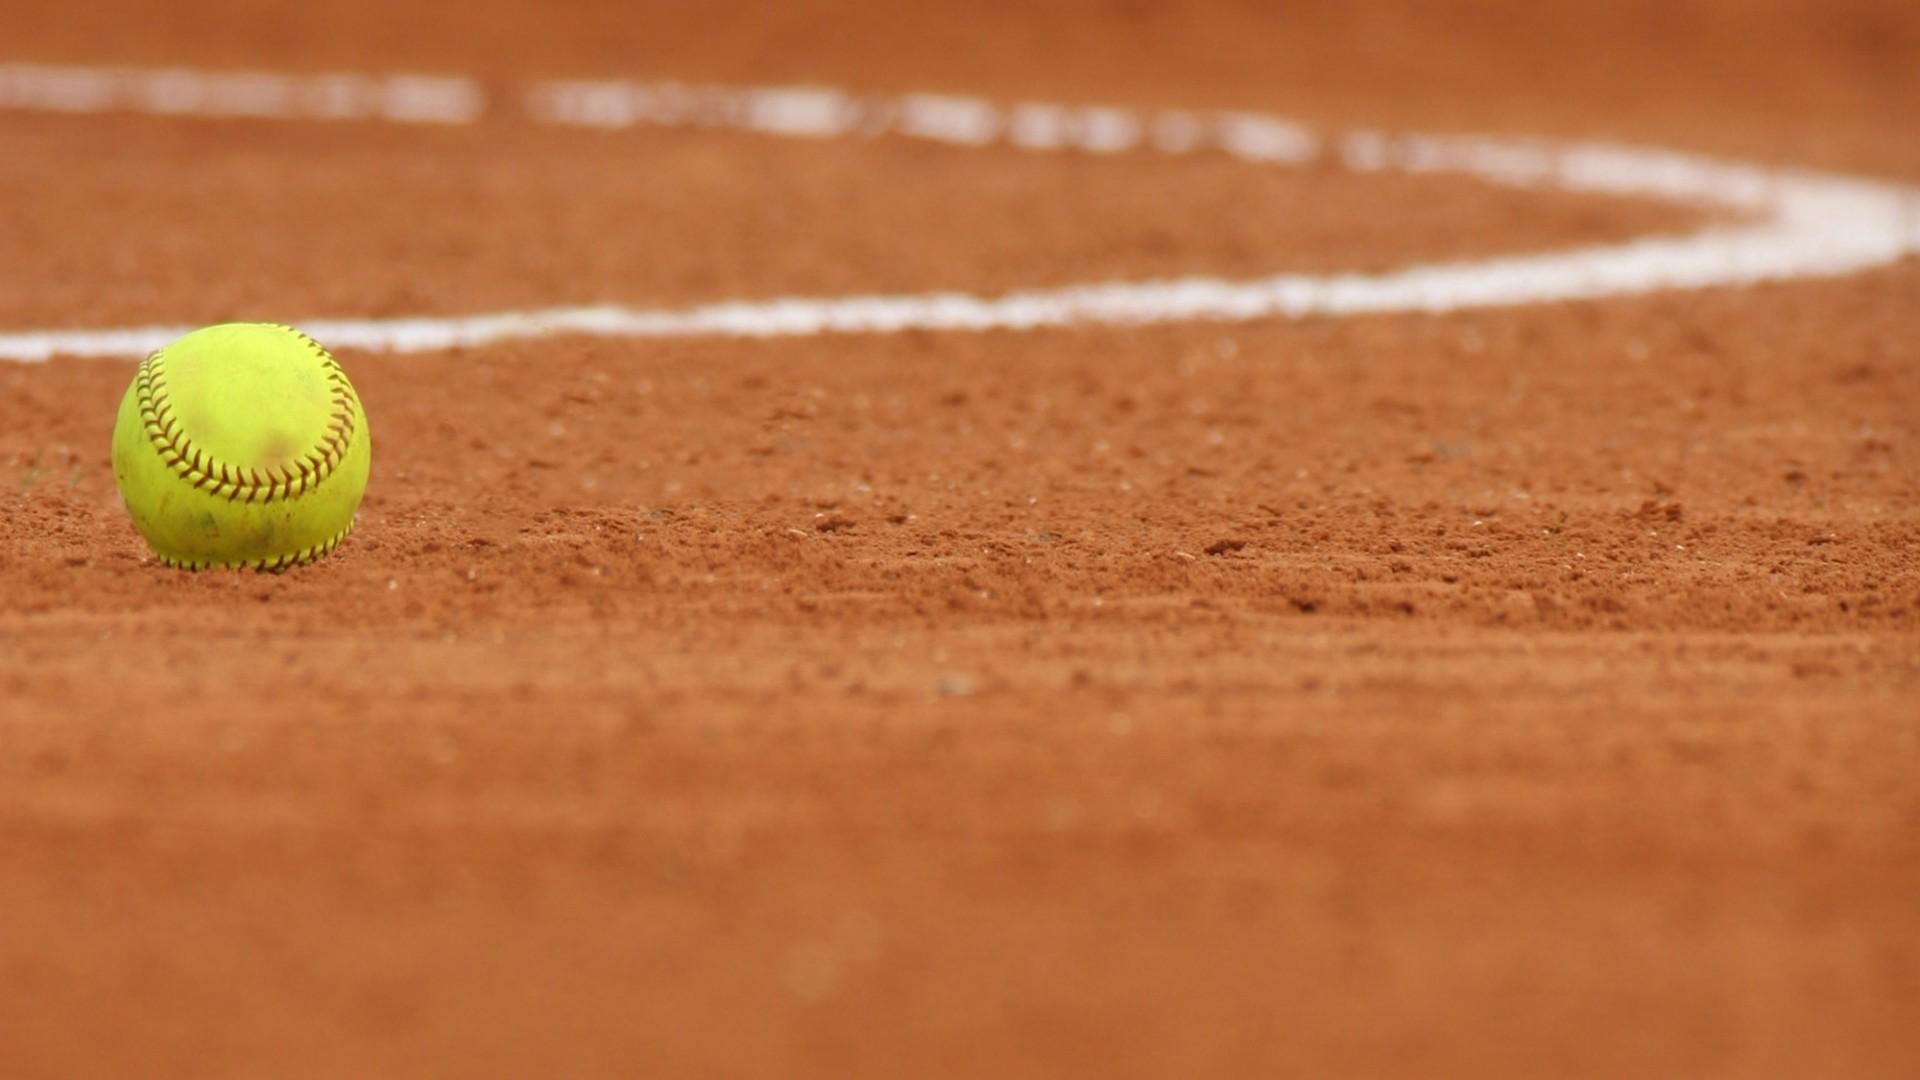 Softball Download Wallpaper